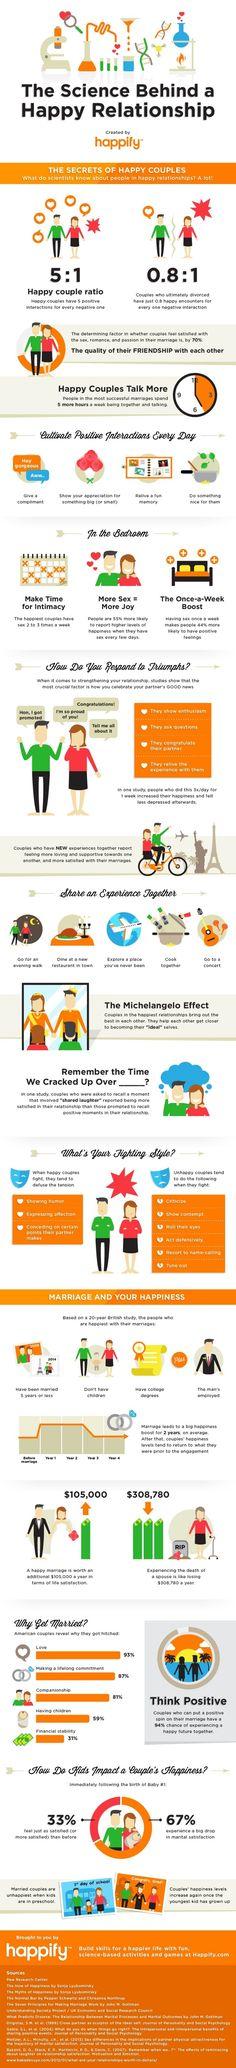 happify infographic